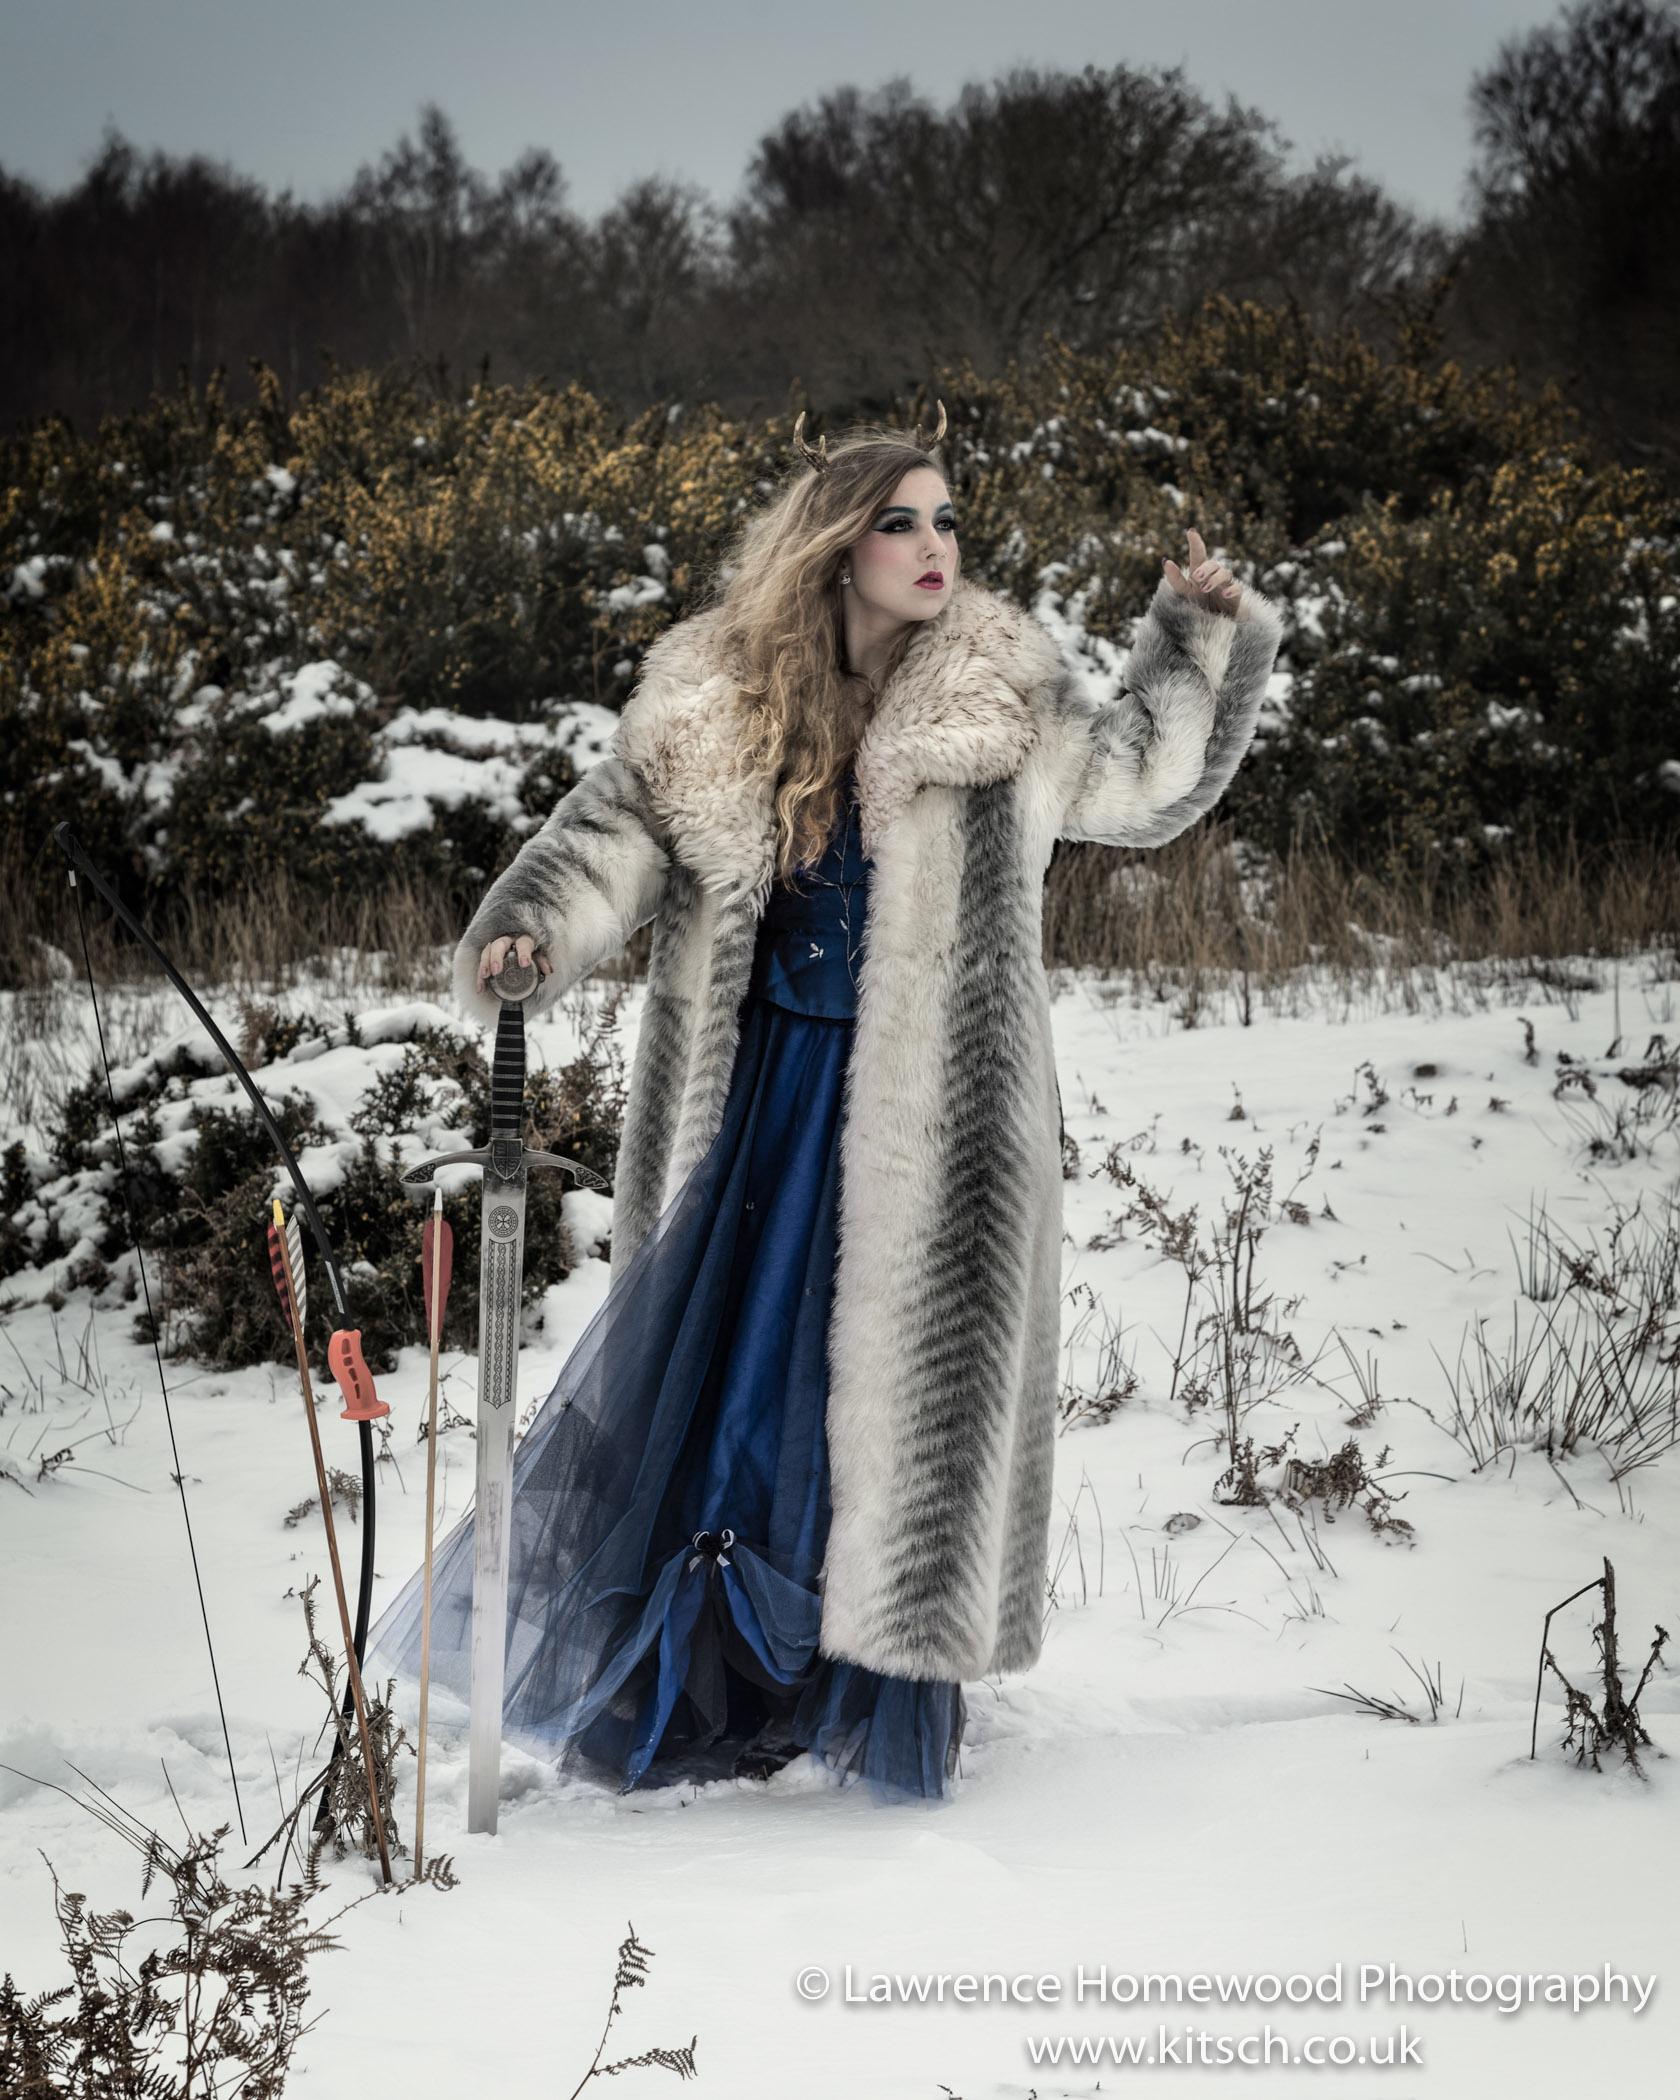 Fawn Princess - A Winters Tale17